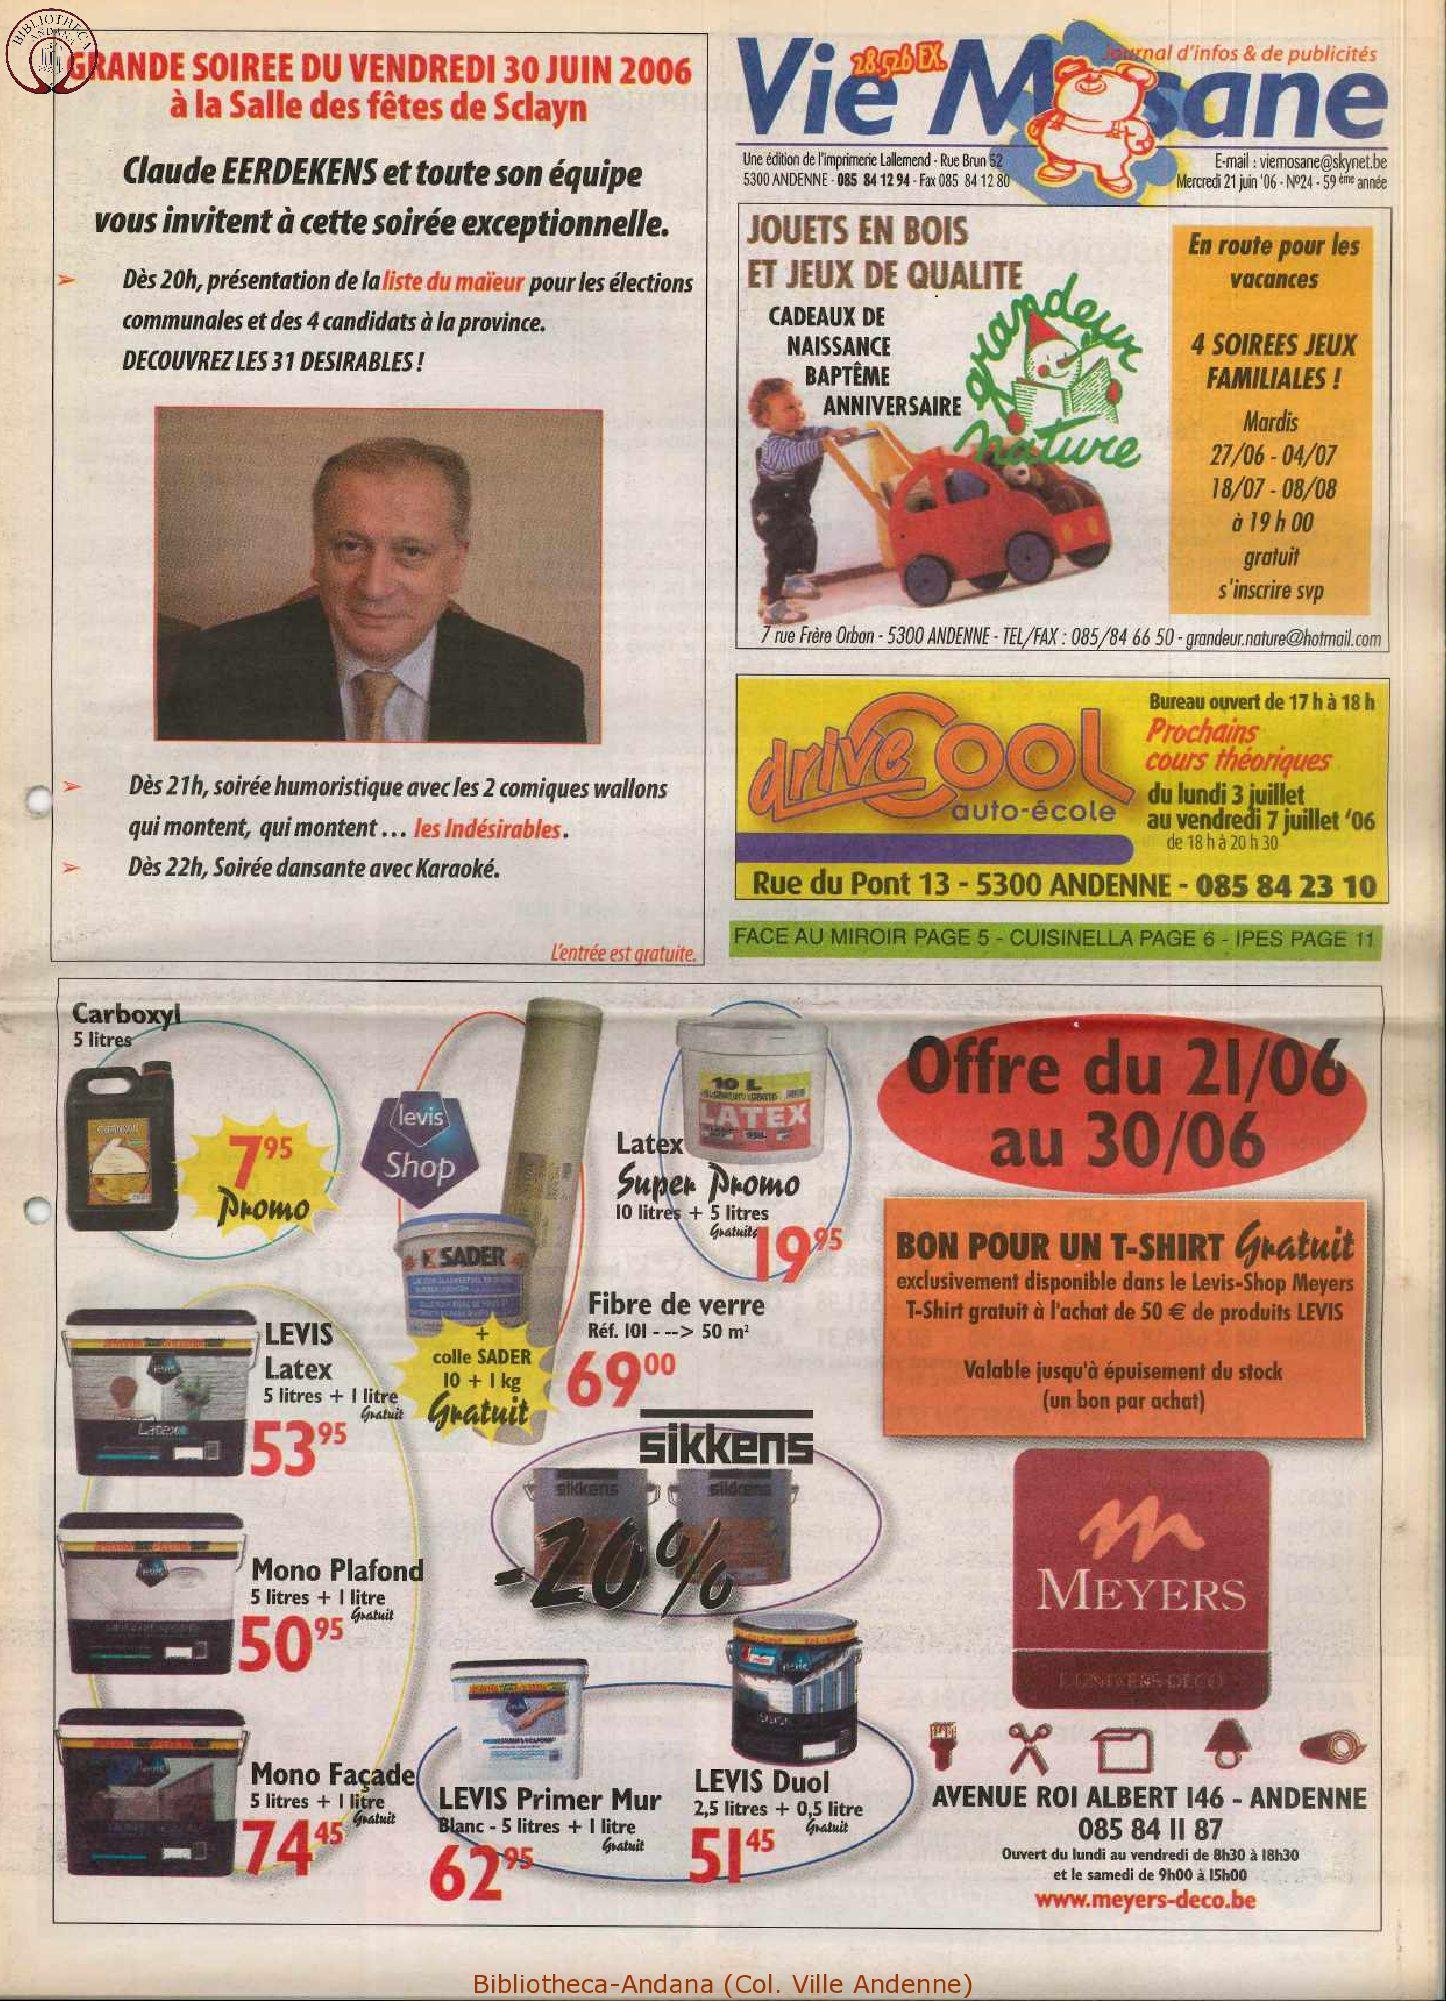 59e année - n°24 - 21 juin 2006